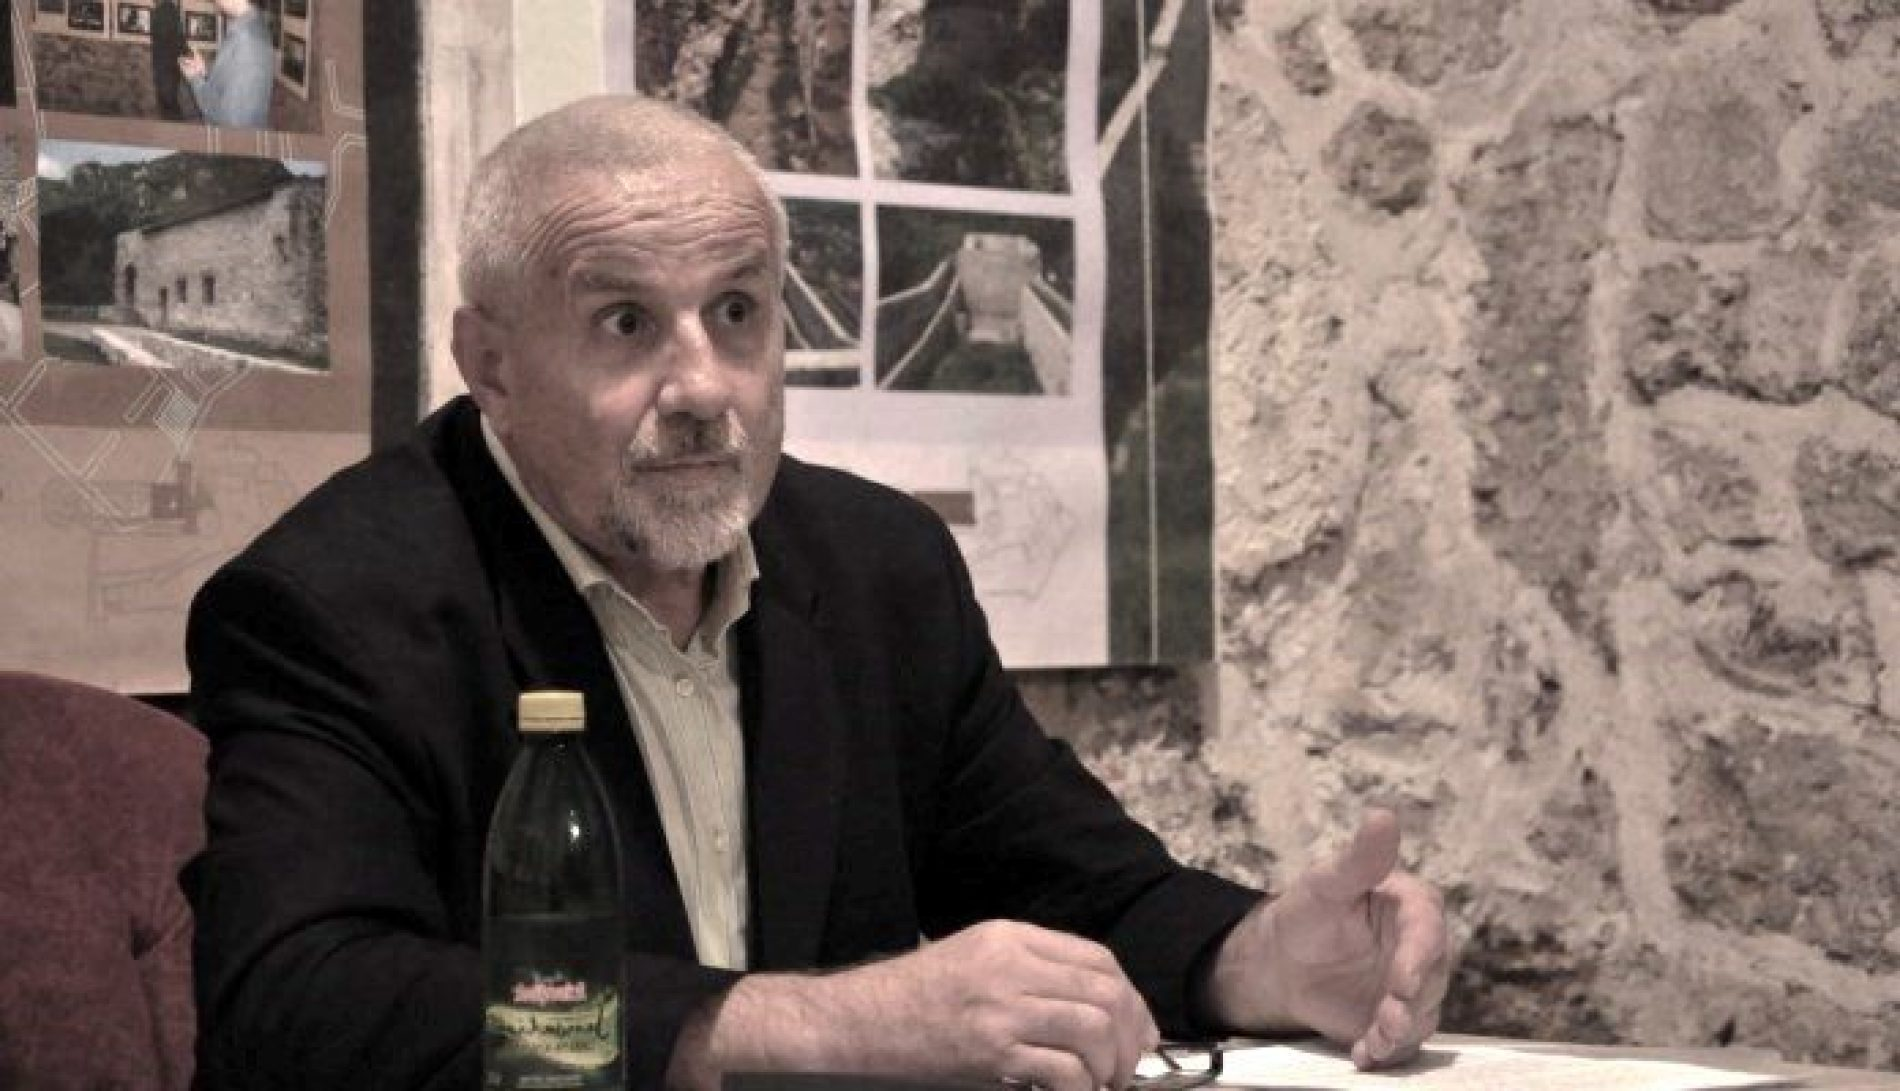 Preminuo poznati zenički historičar i profesor Salih Jalimam